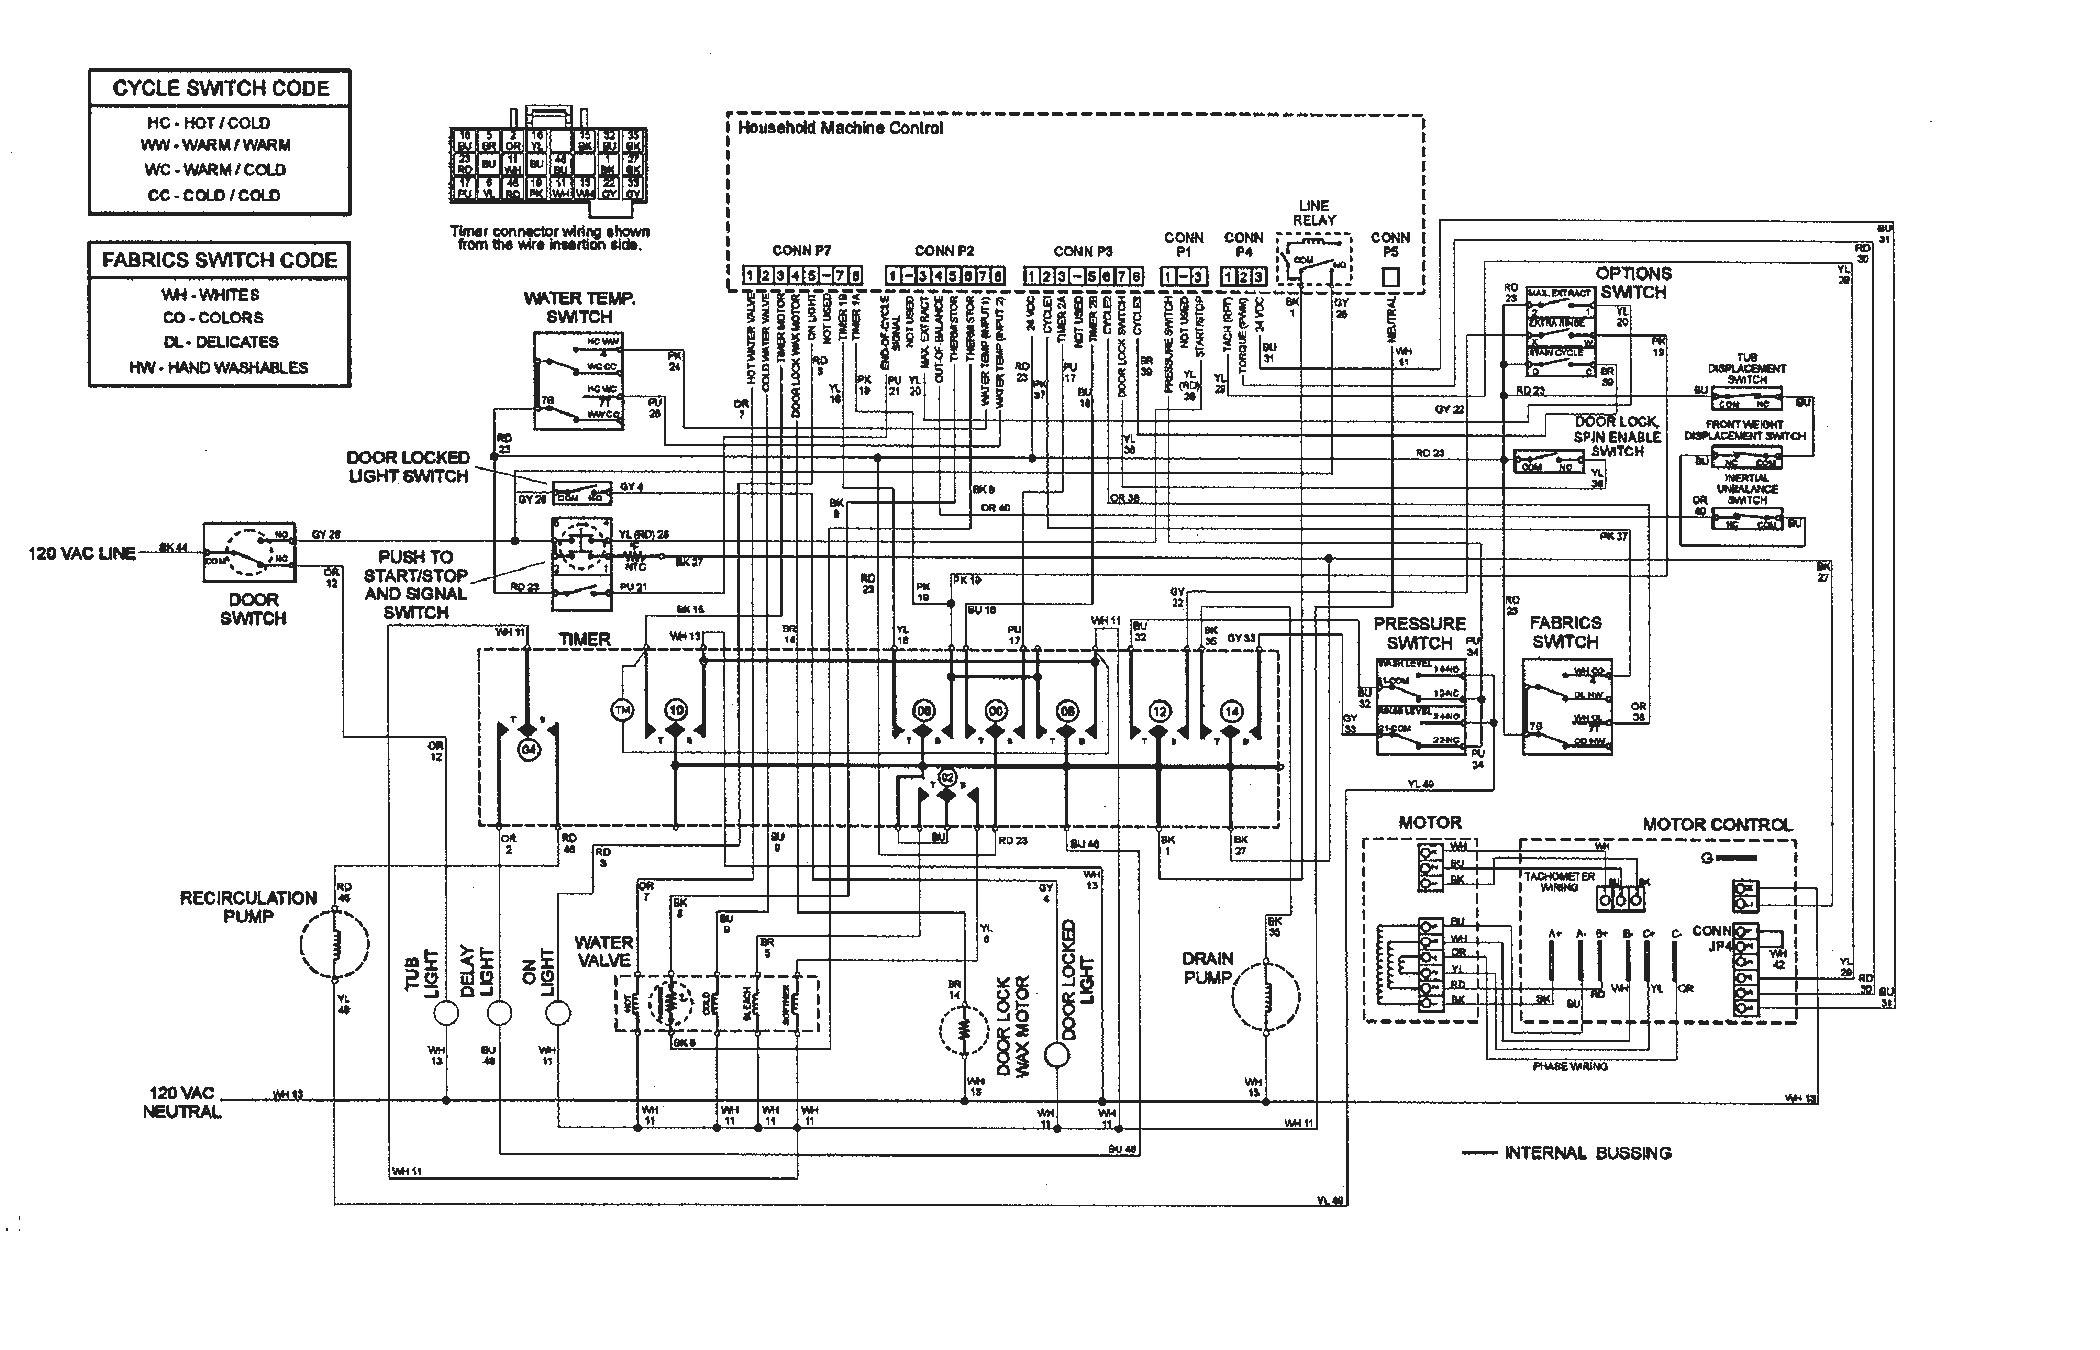 Maytag Washer Wiring Diagram Inspiration Maytag Washer Parts Model - Maytag Dryer Wiring Diagram